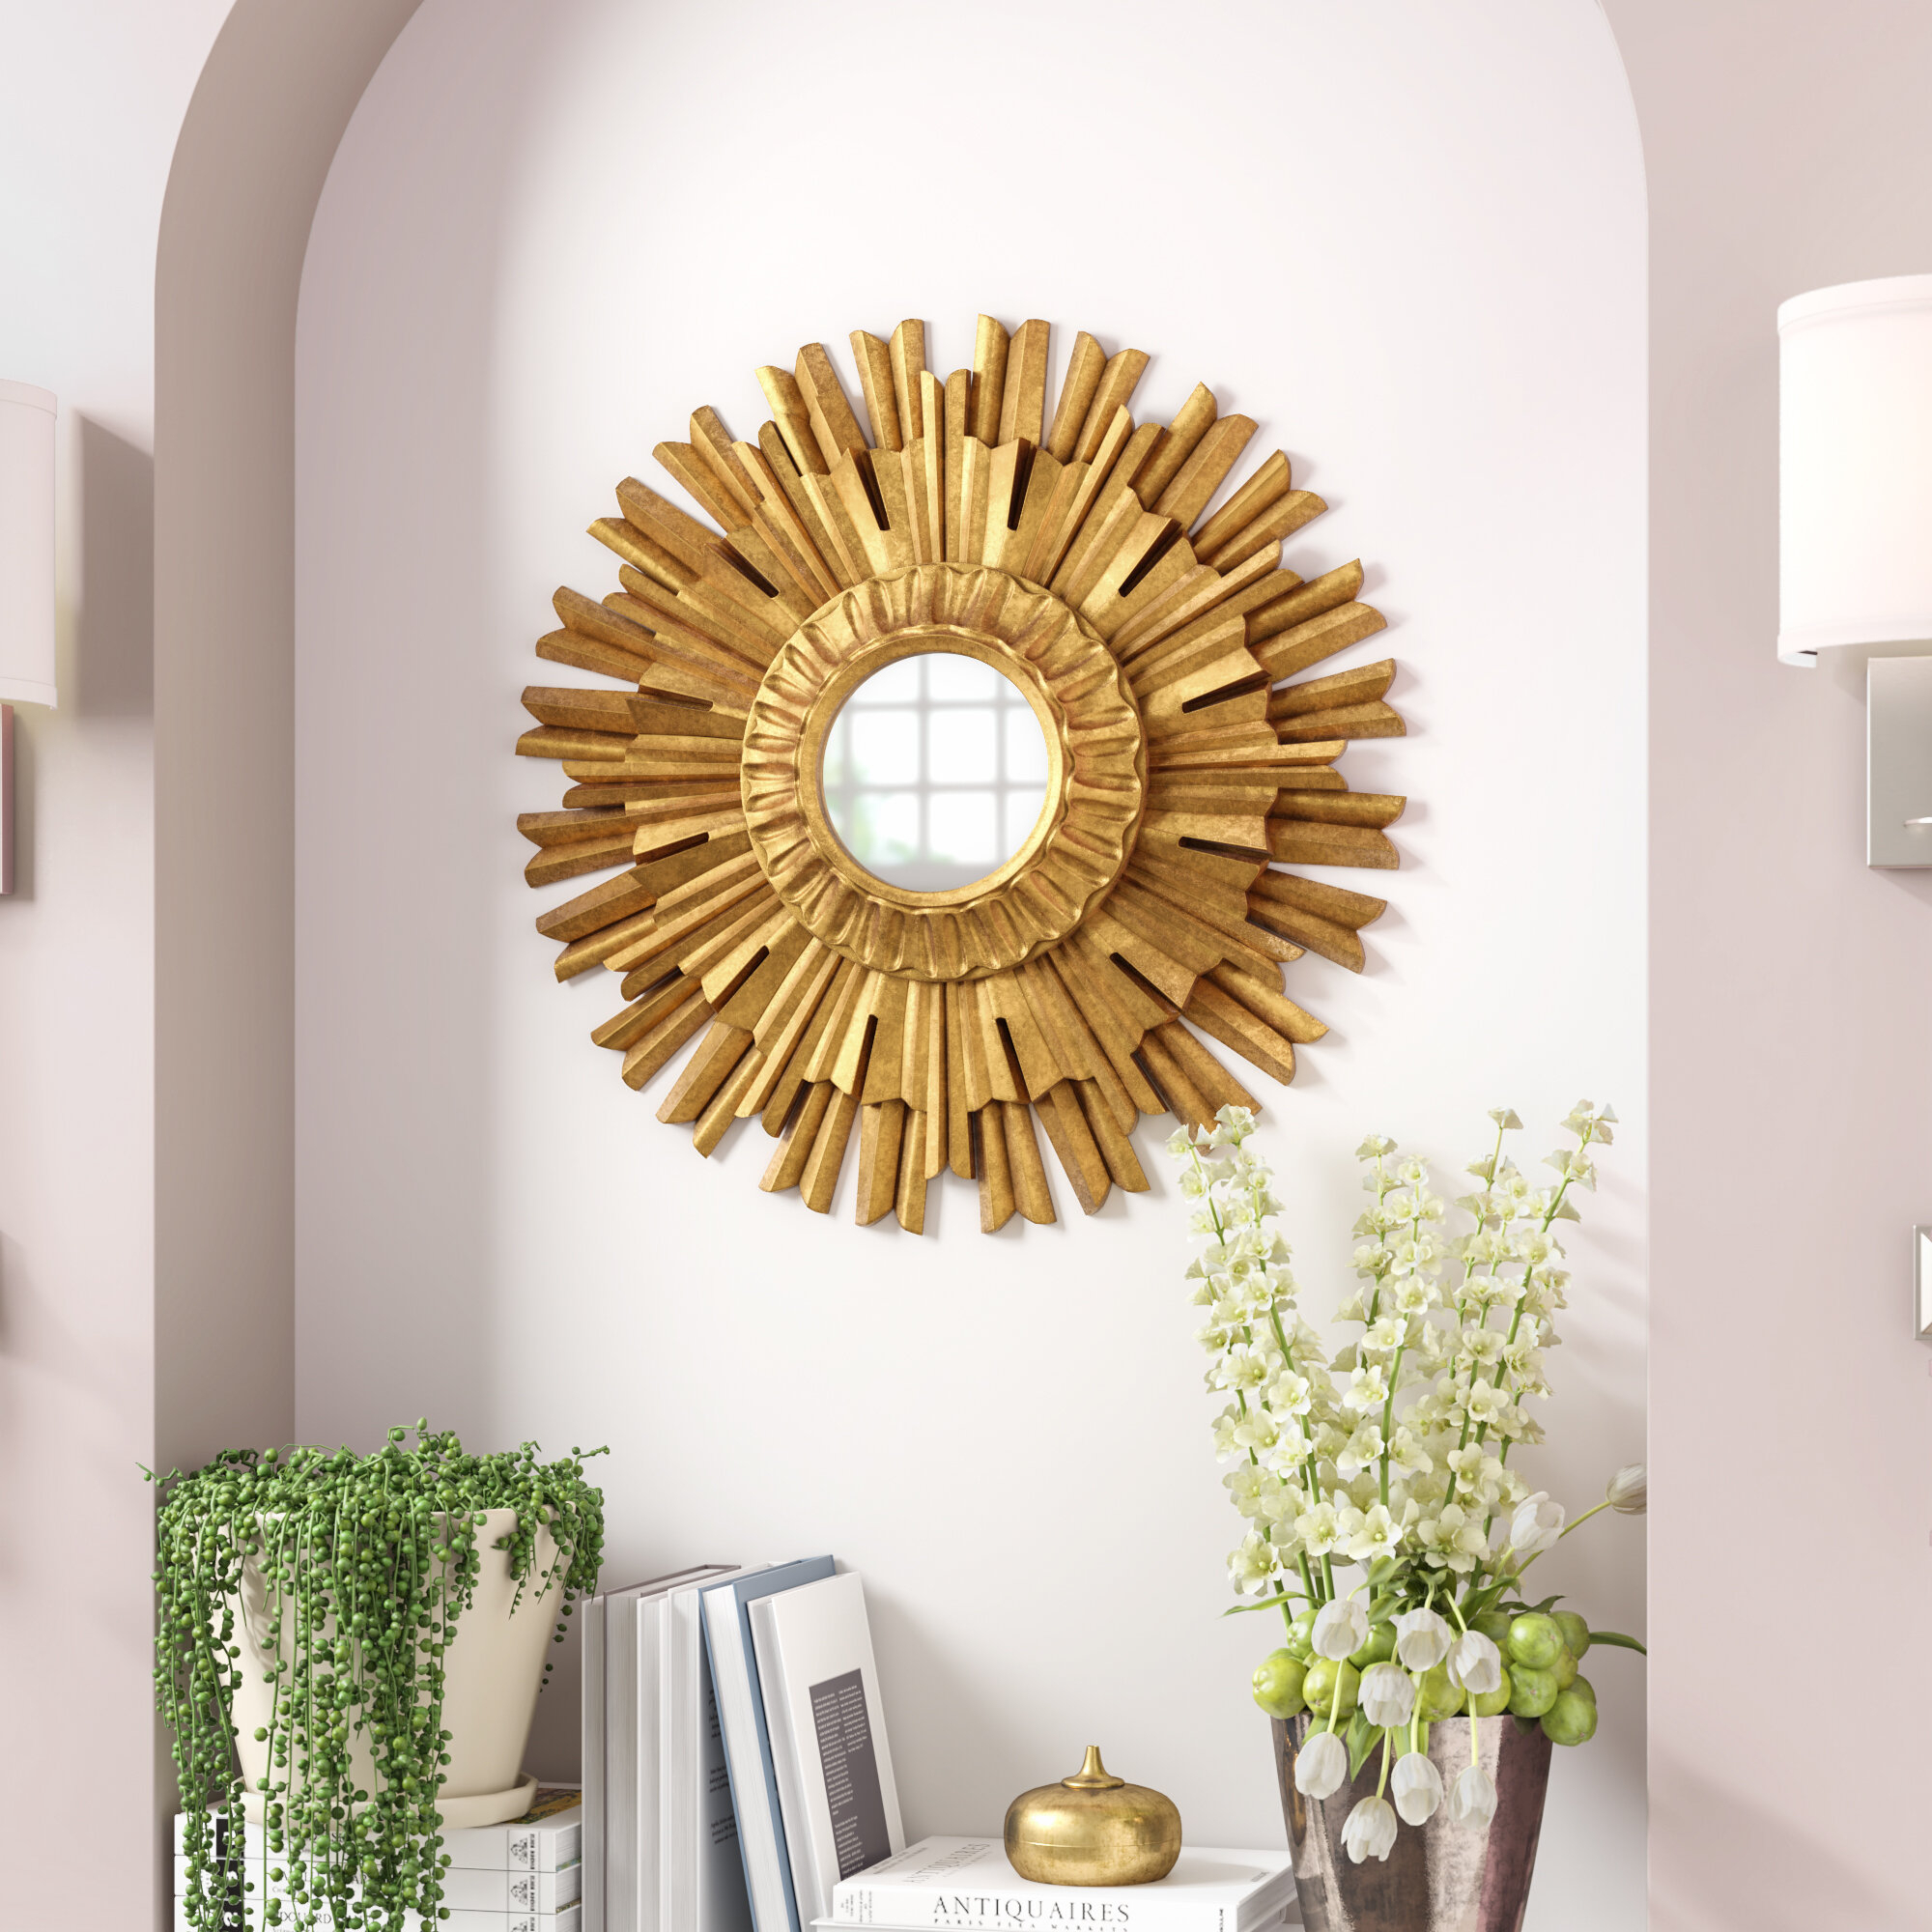 Durkee Circular Wall Mirror regarding Starburst Wall Decor By Willa Arlo Interiors (Image 6 of 30)